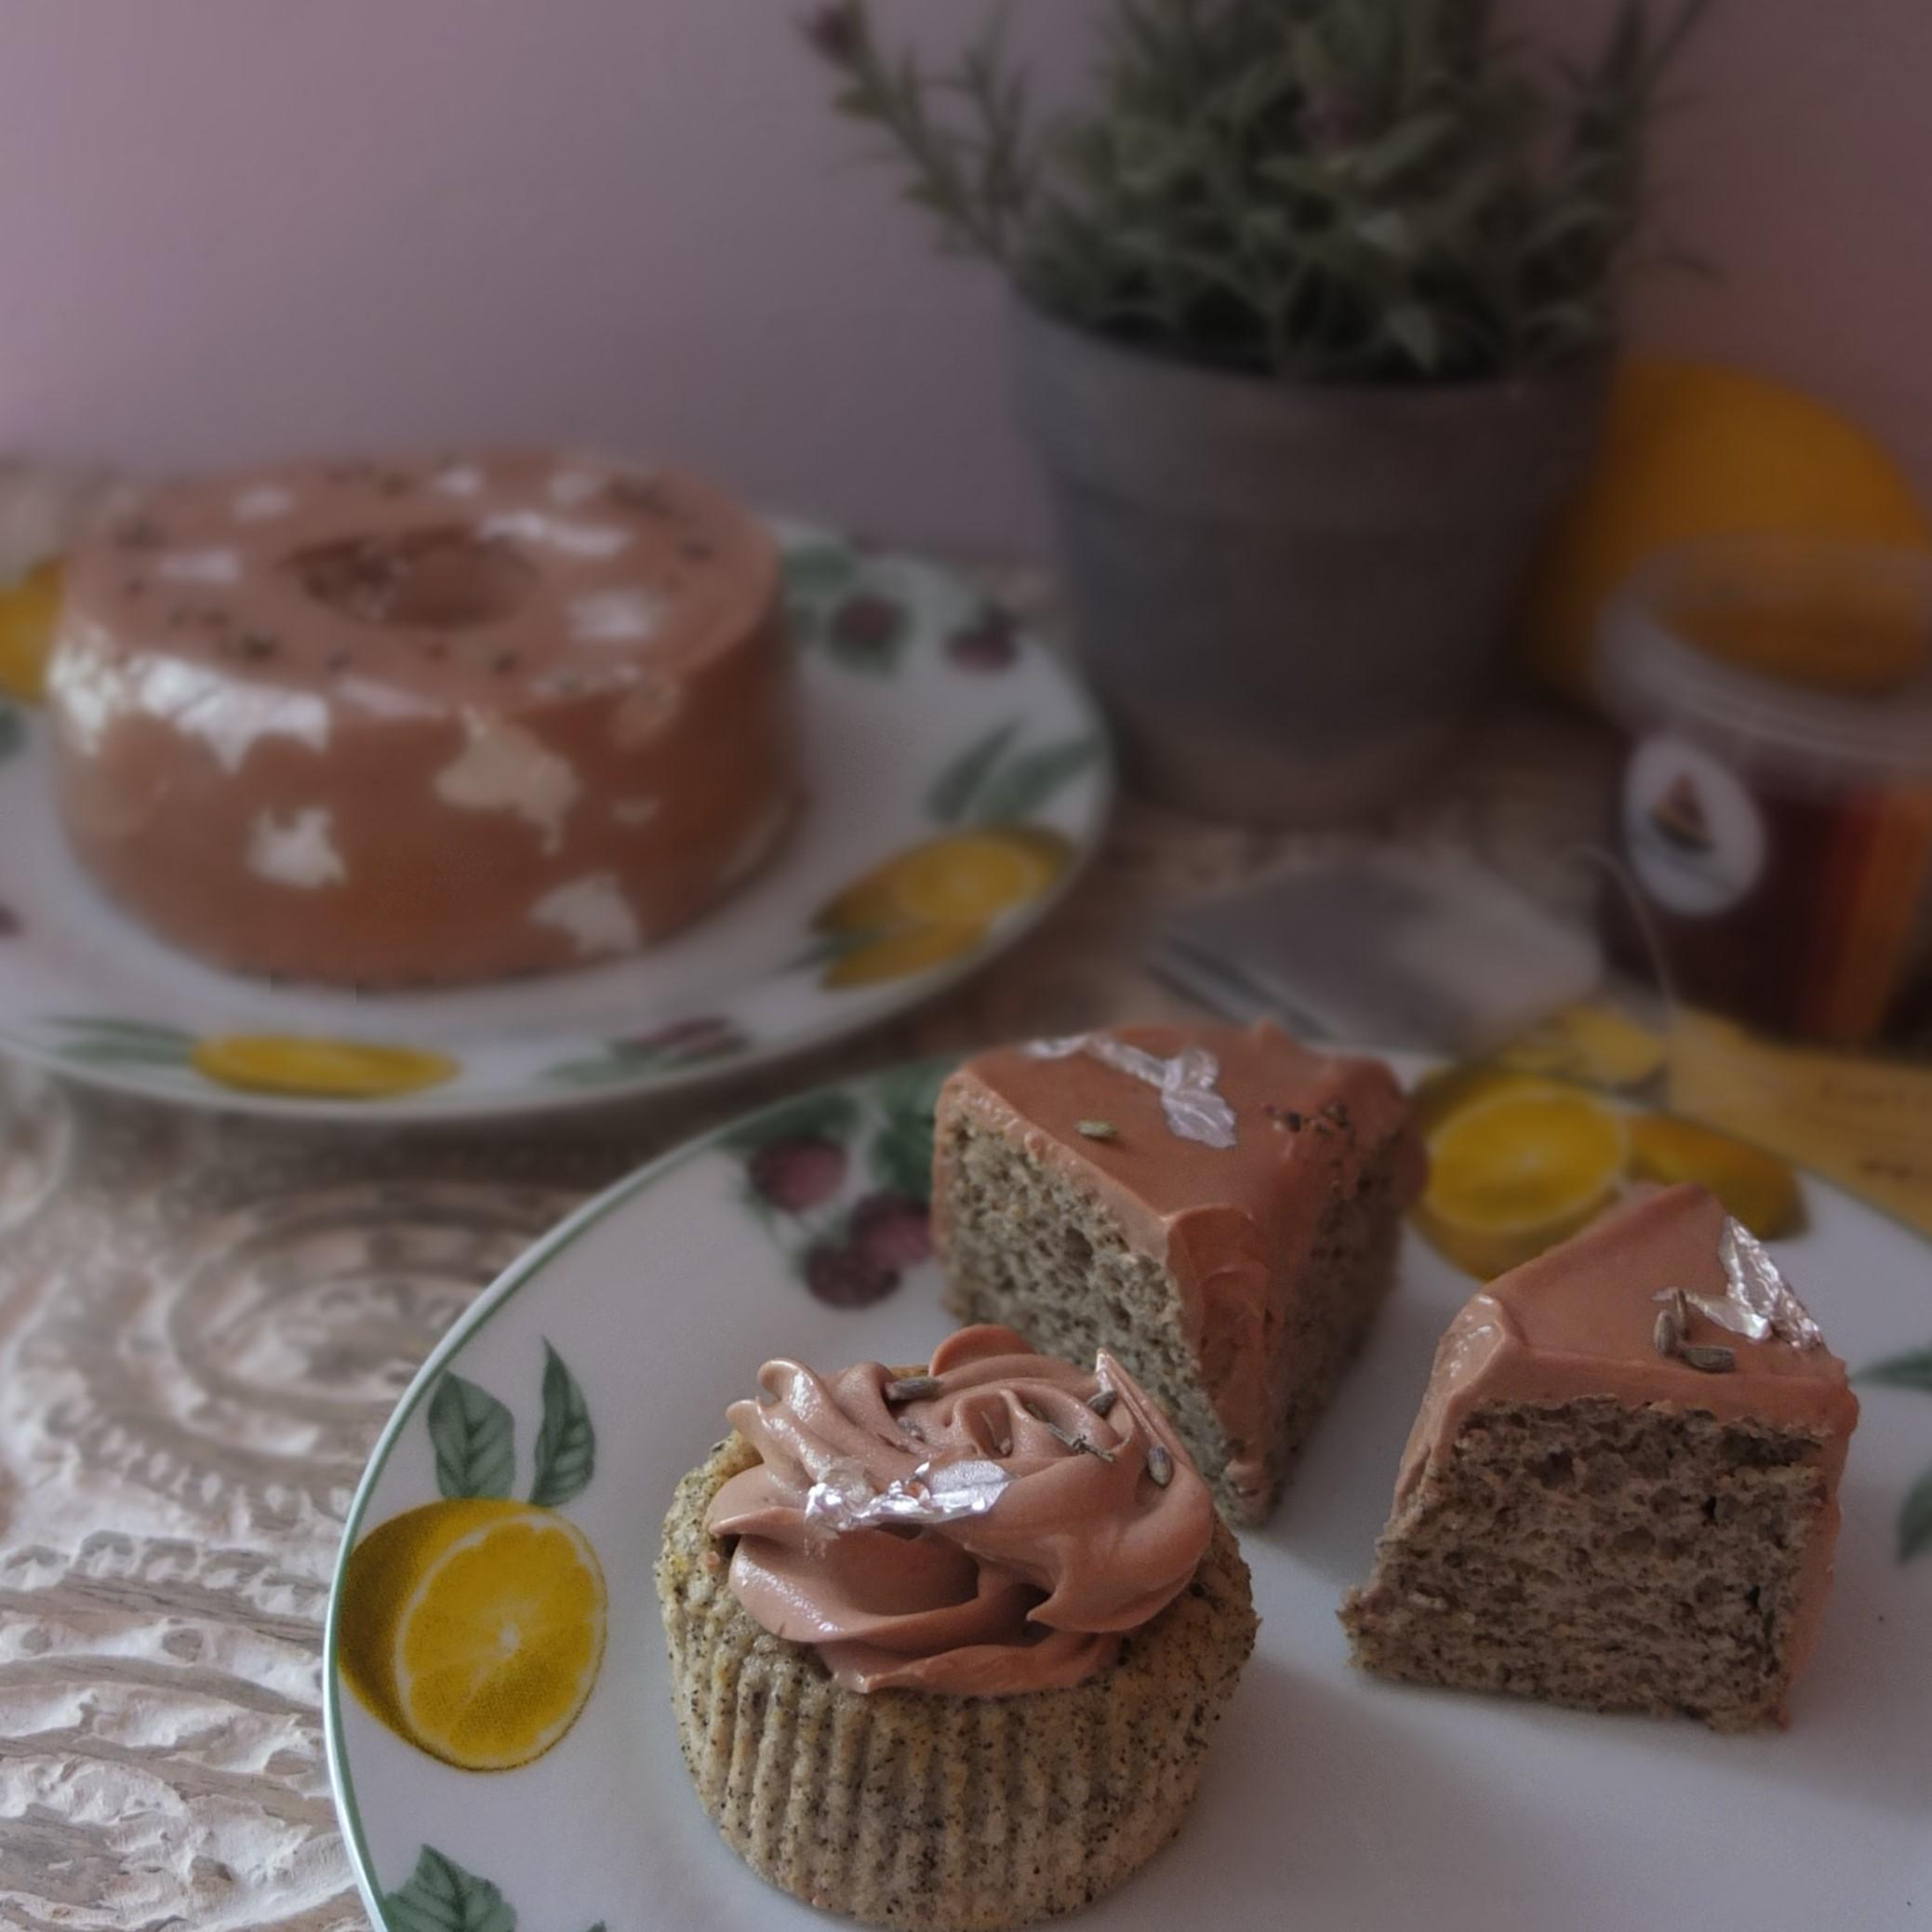 Earl Grey Lemon Chiffon Cake